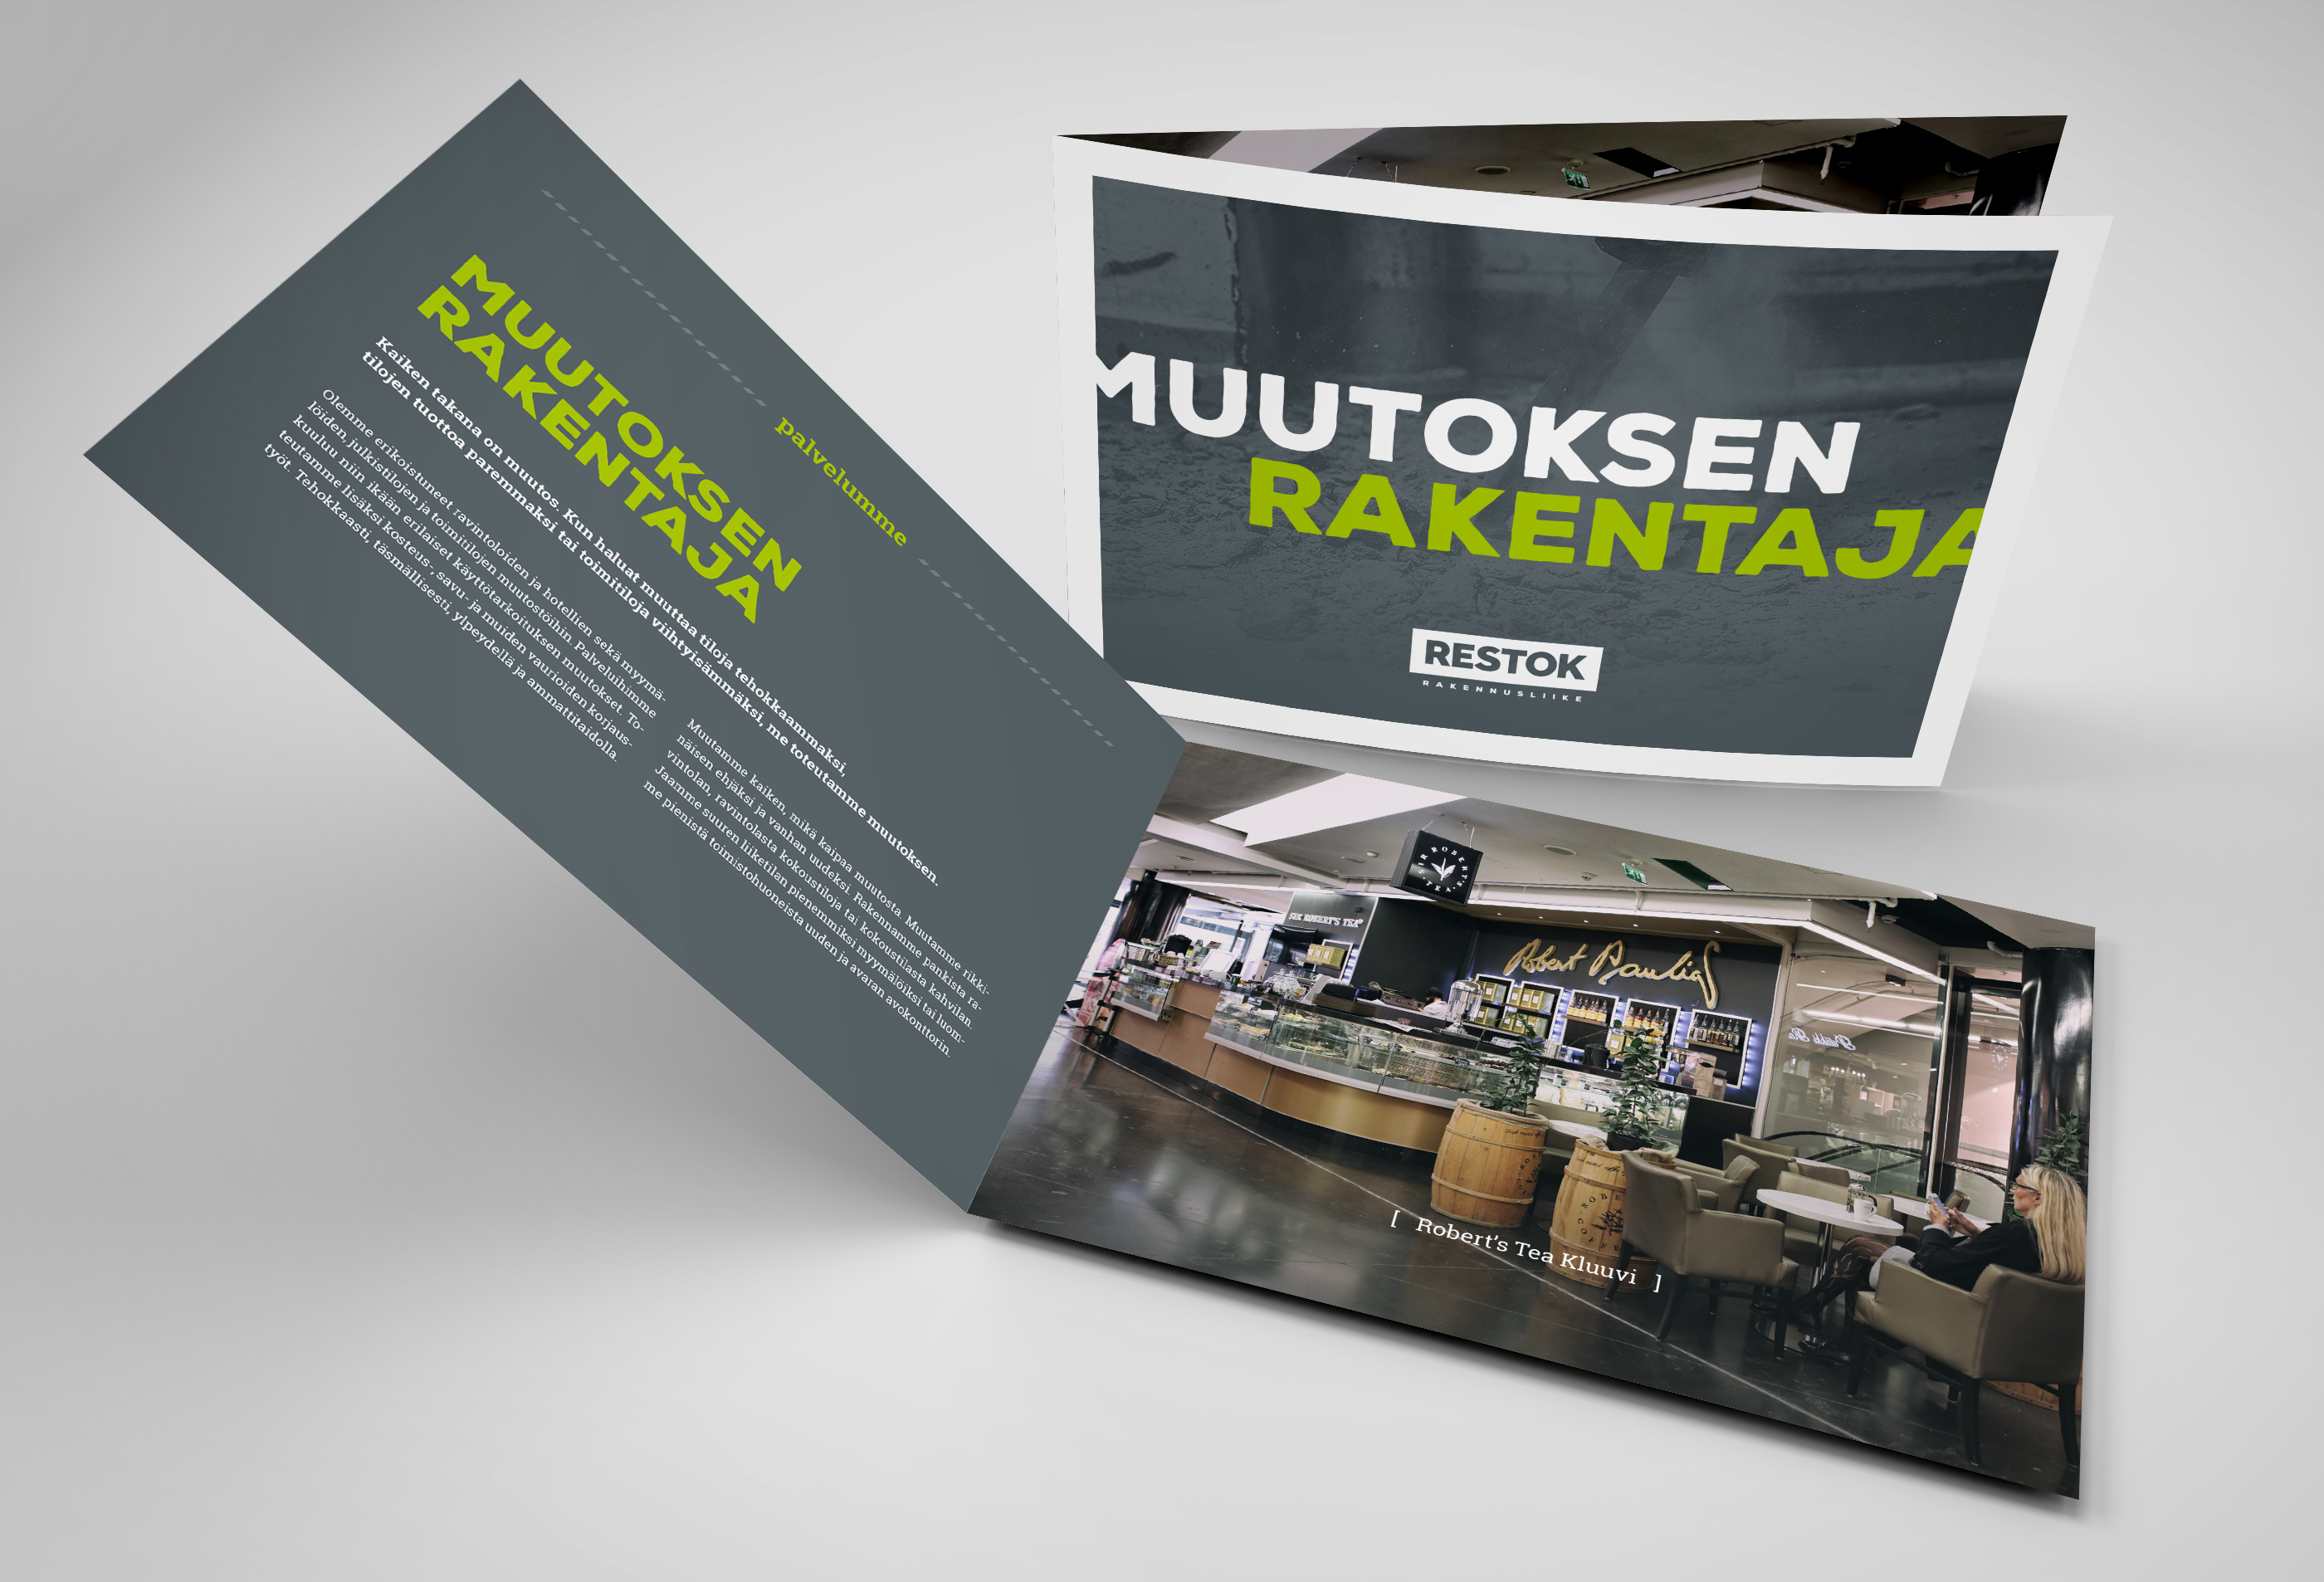 restok_brandbook1